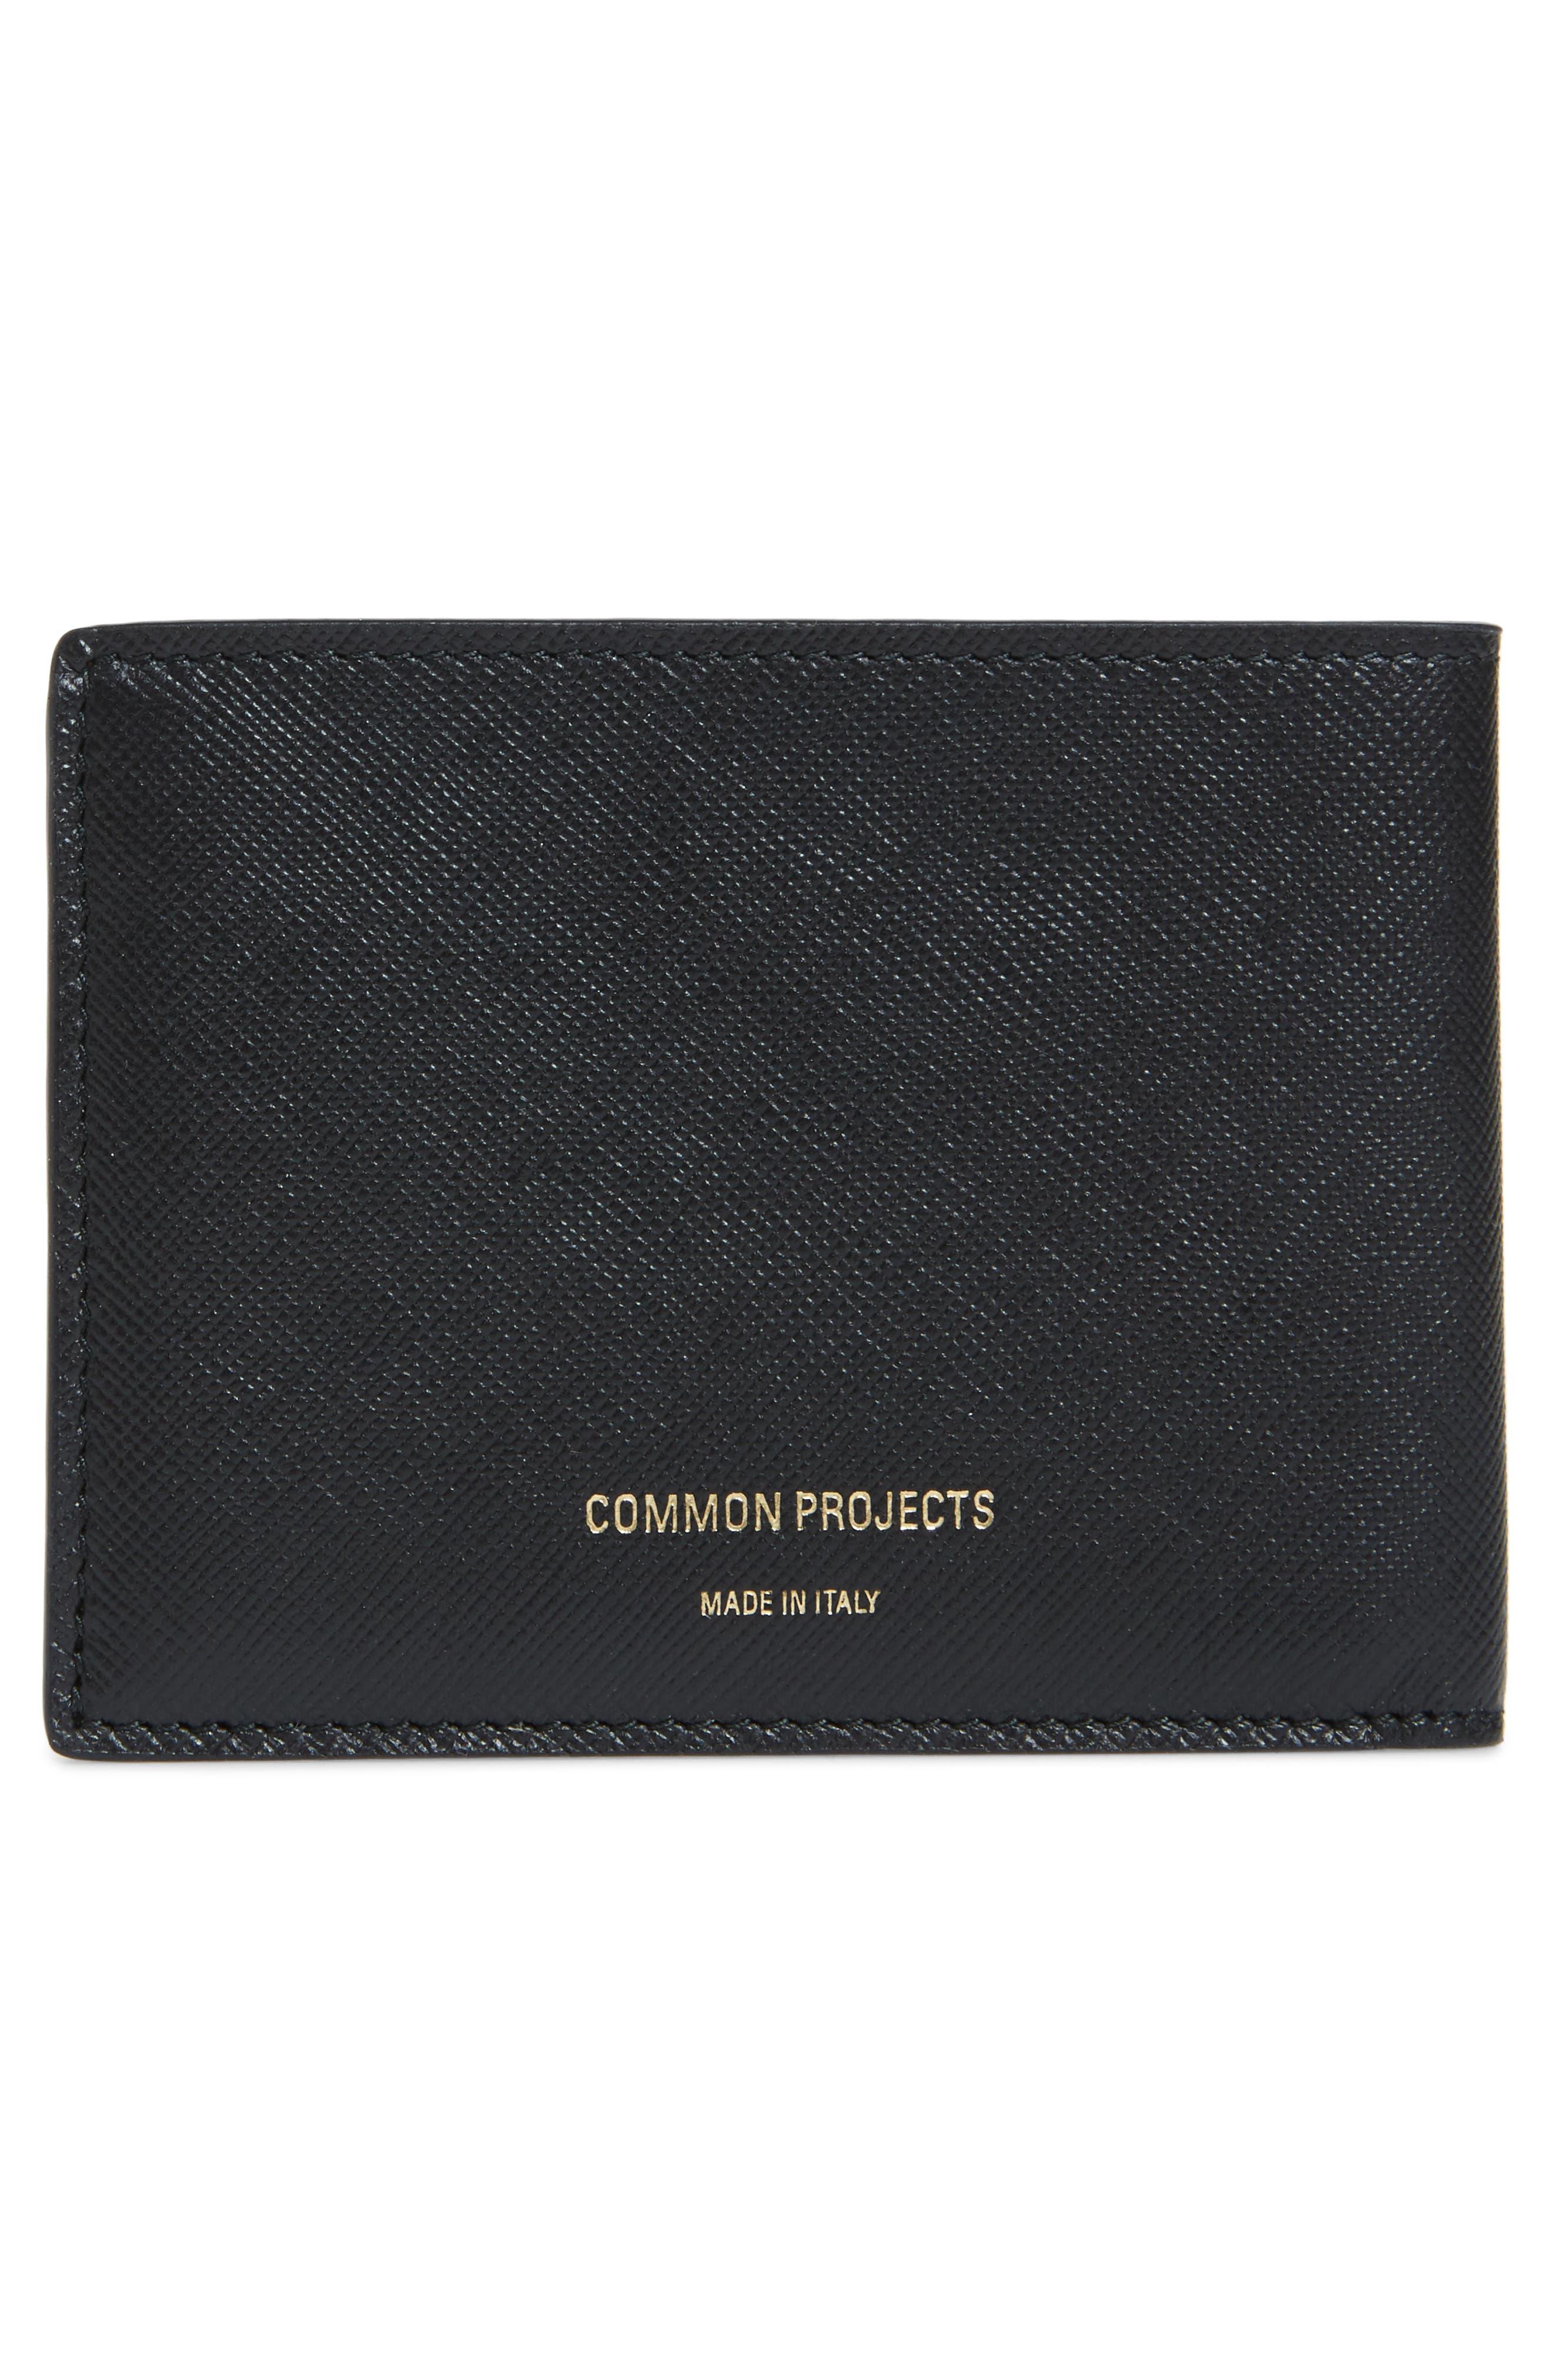 Saffiano Leather Wallet,                             Alternate thumbnail 3, color,                             BLACK